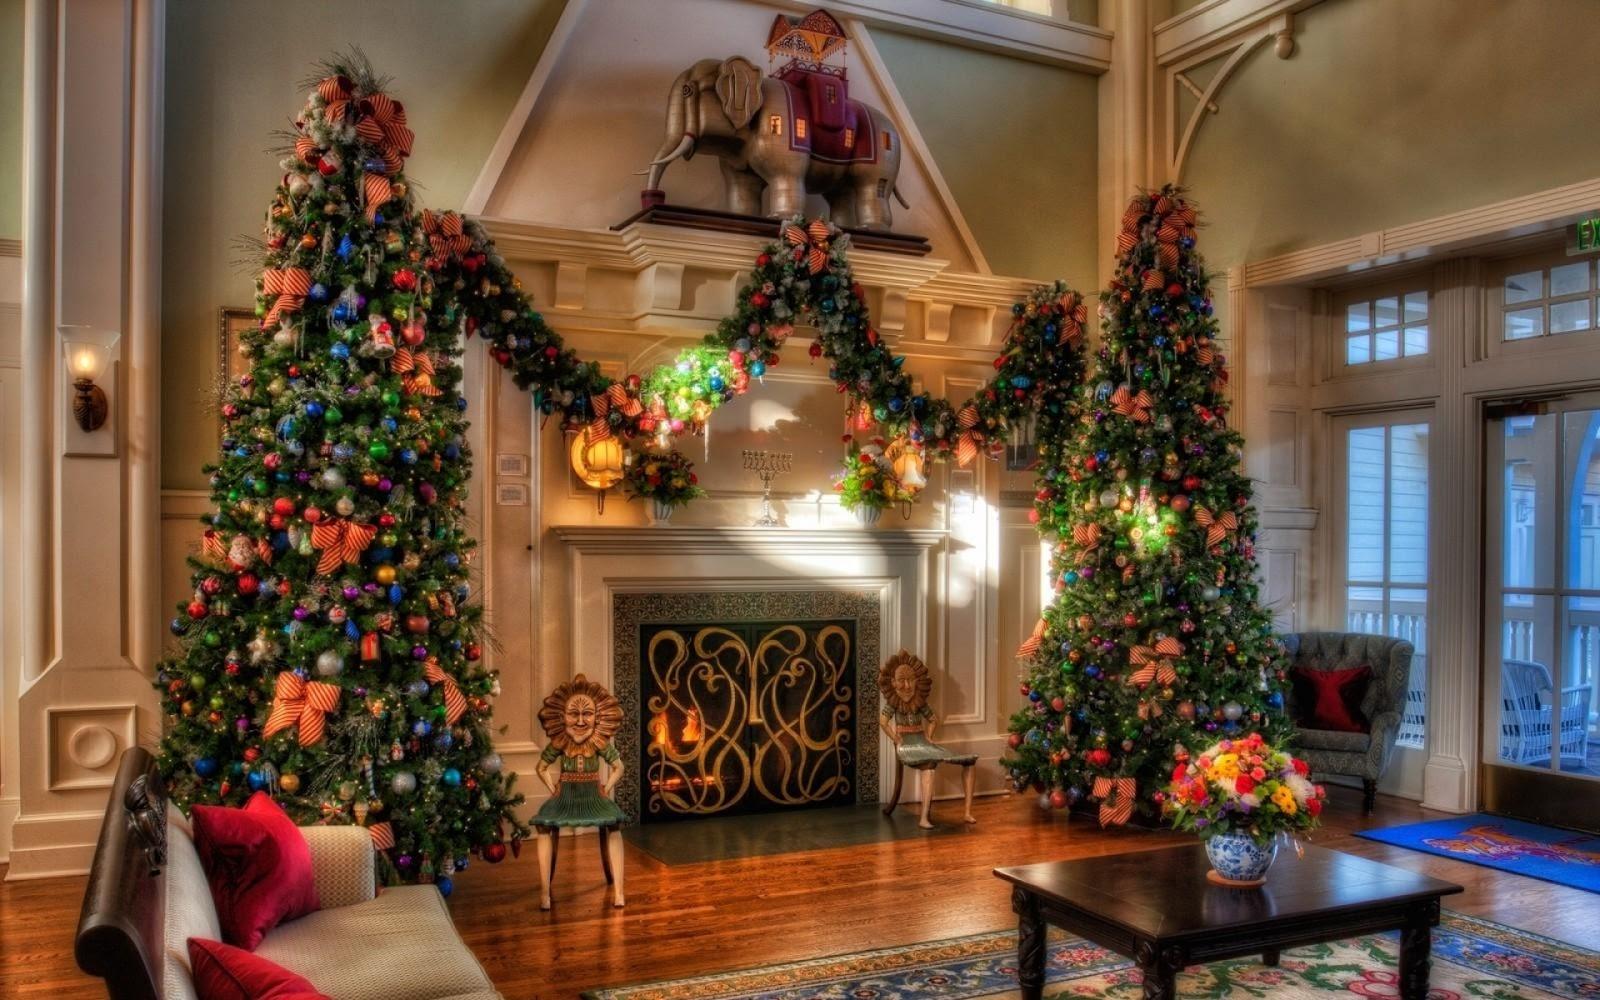 Fachada de casas decoradas para navidad frases de amor for Casas decoradas por dentro